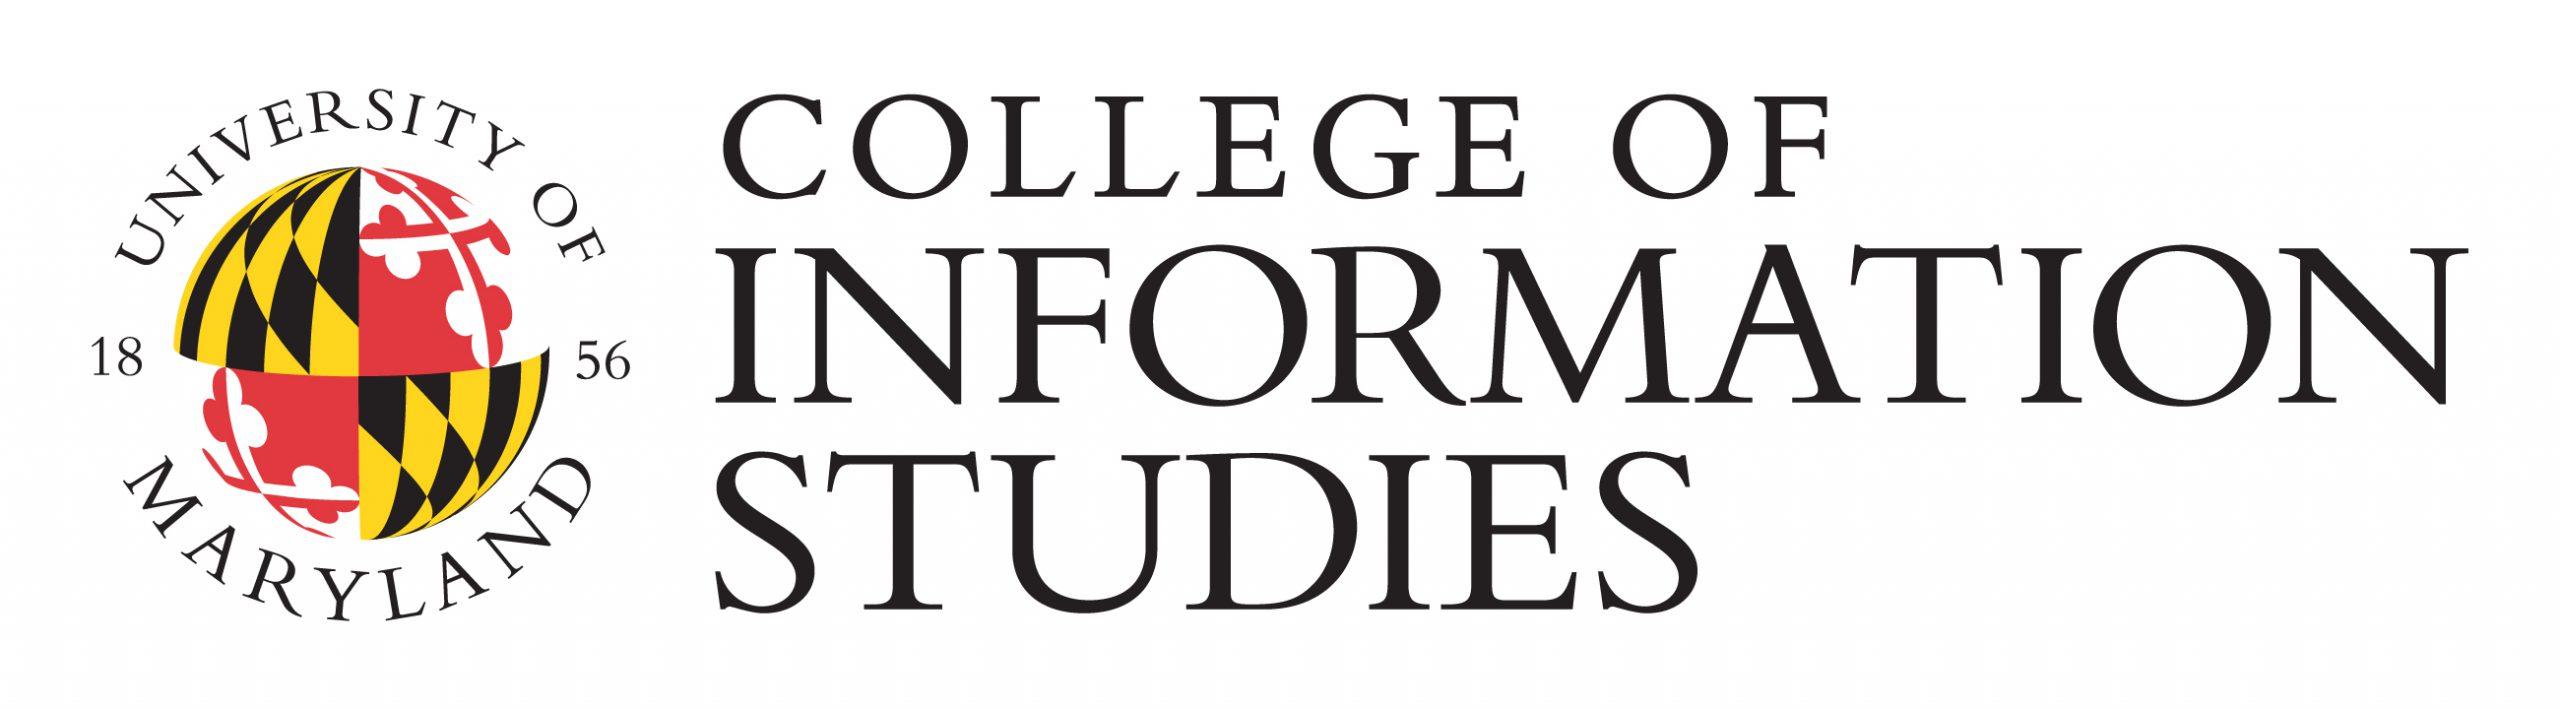 university of maryland college of information studies logo